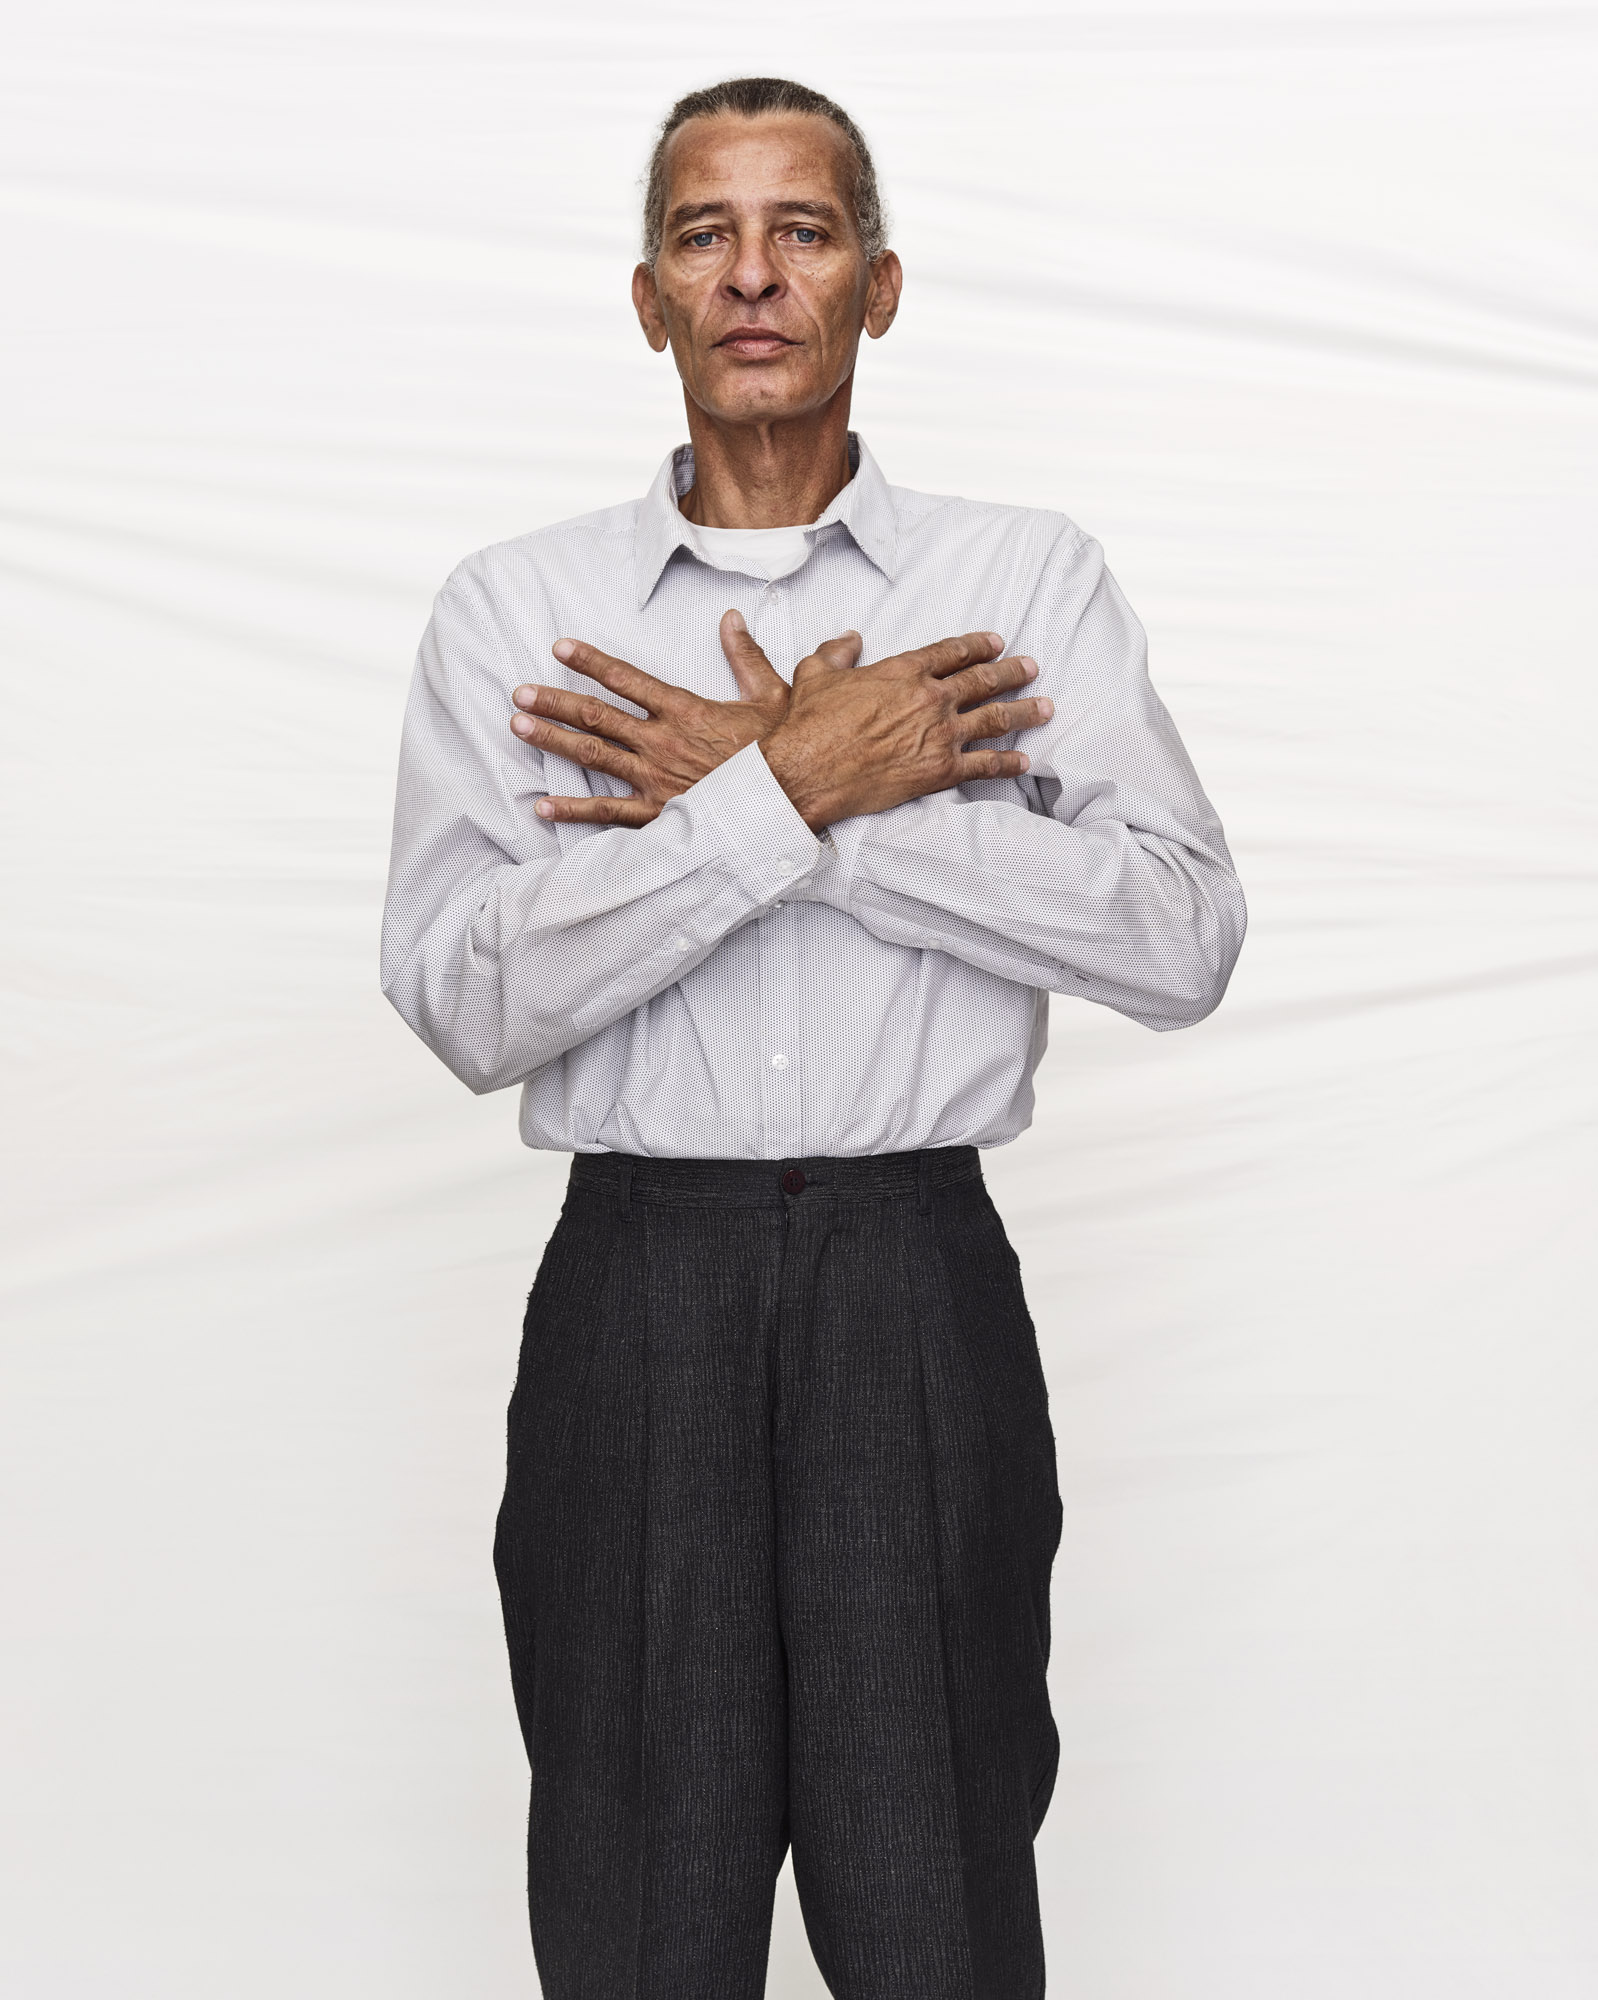 Carlos Nielbock